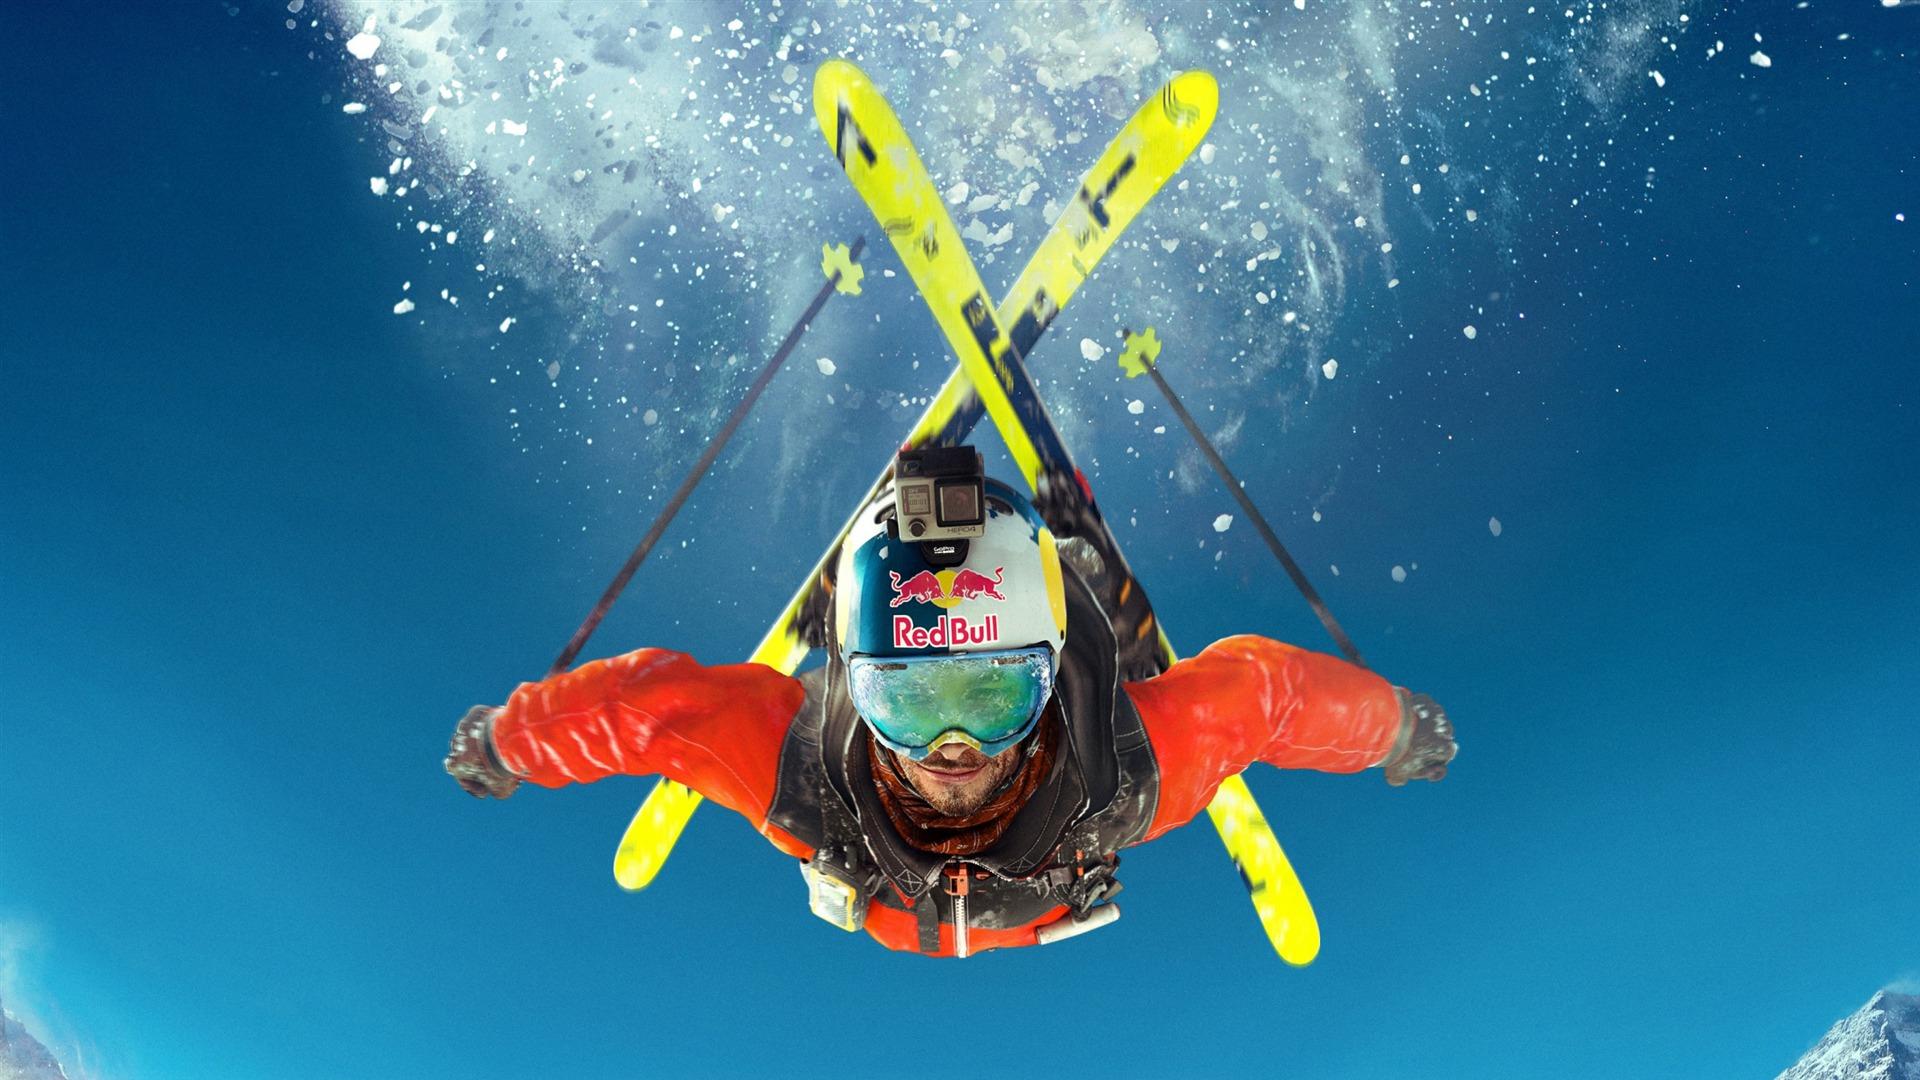 Skiing Sport Wallpaper Iphone: 急なスキー極端なスポーツ-スポーツポスター壁紙プレビュー